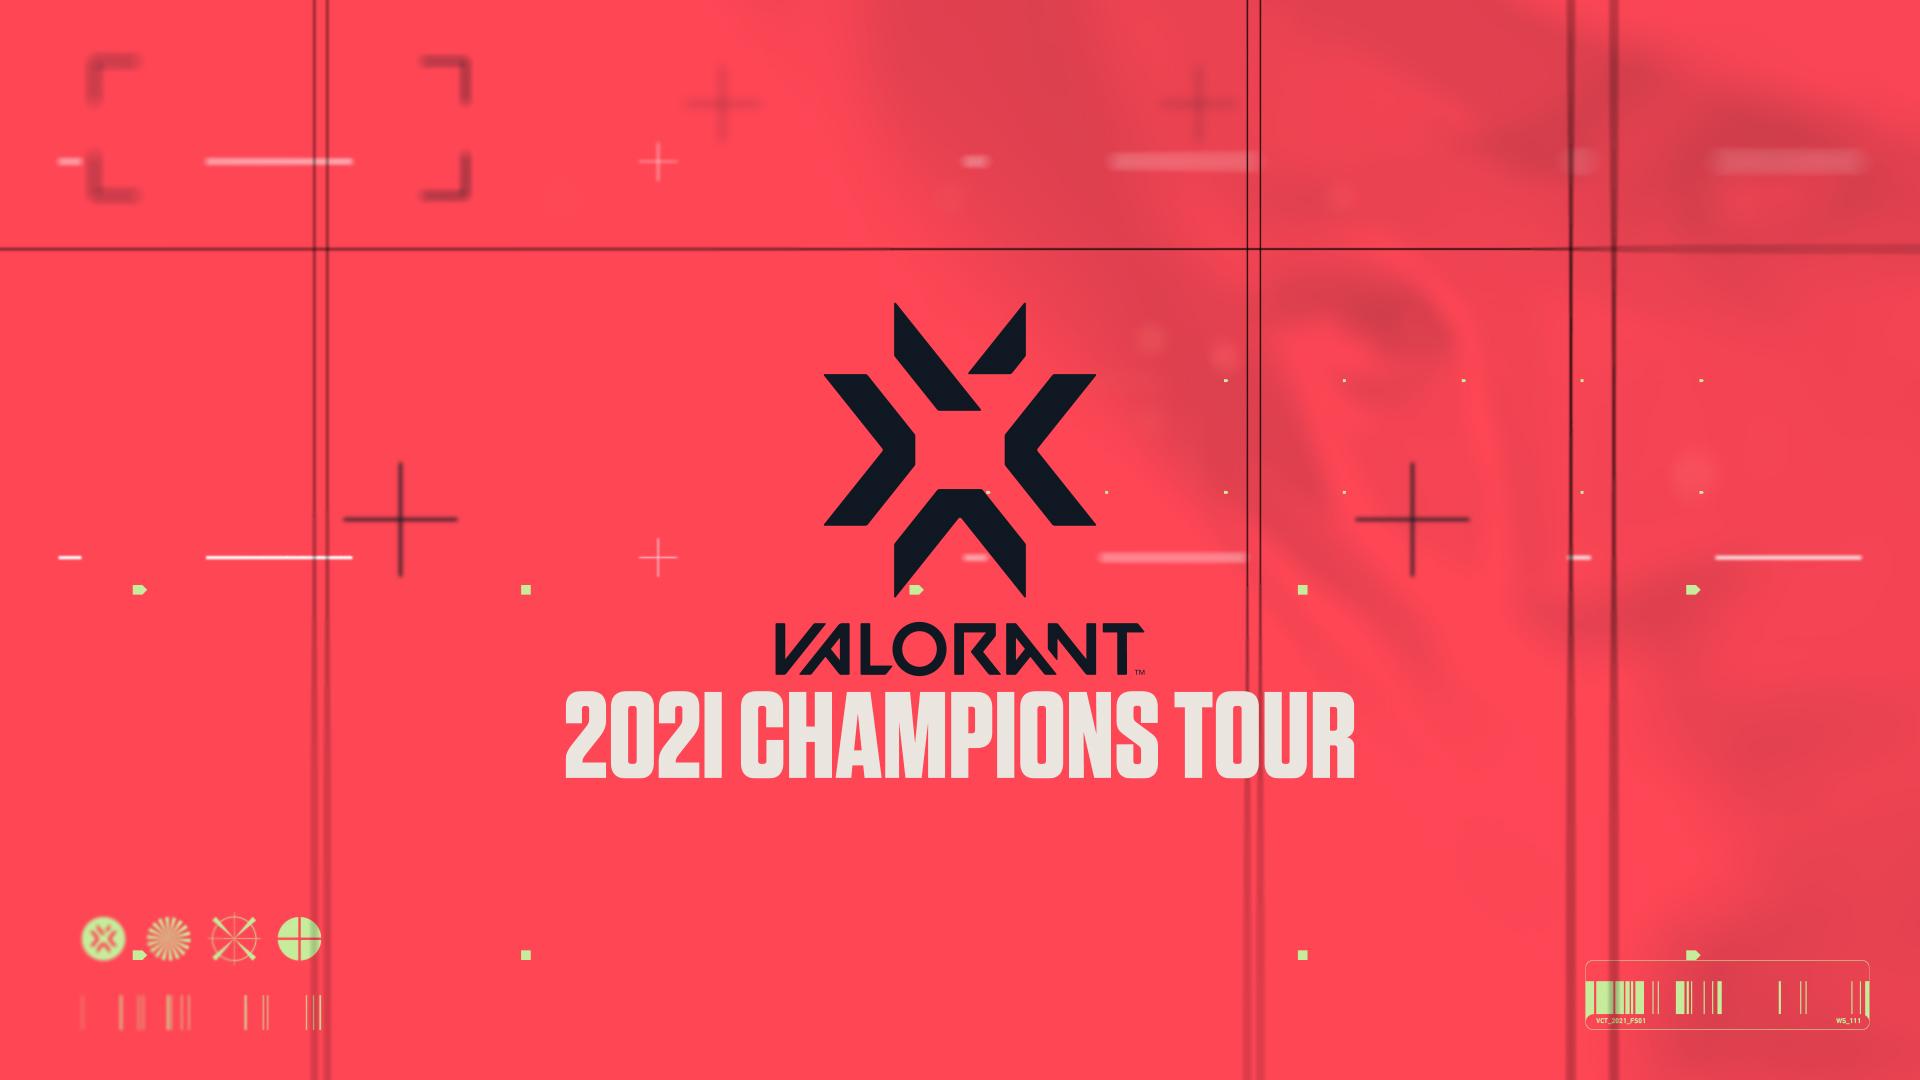 Valorant Champions Tour header